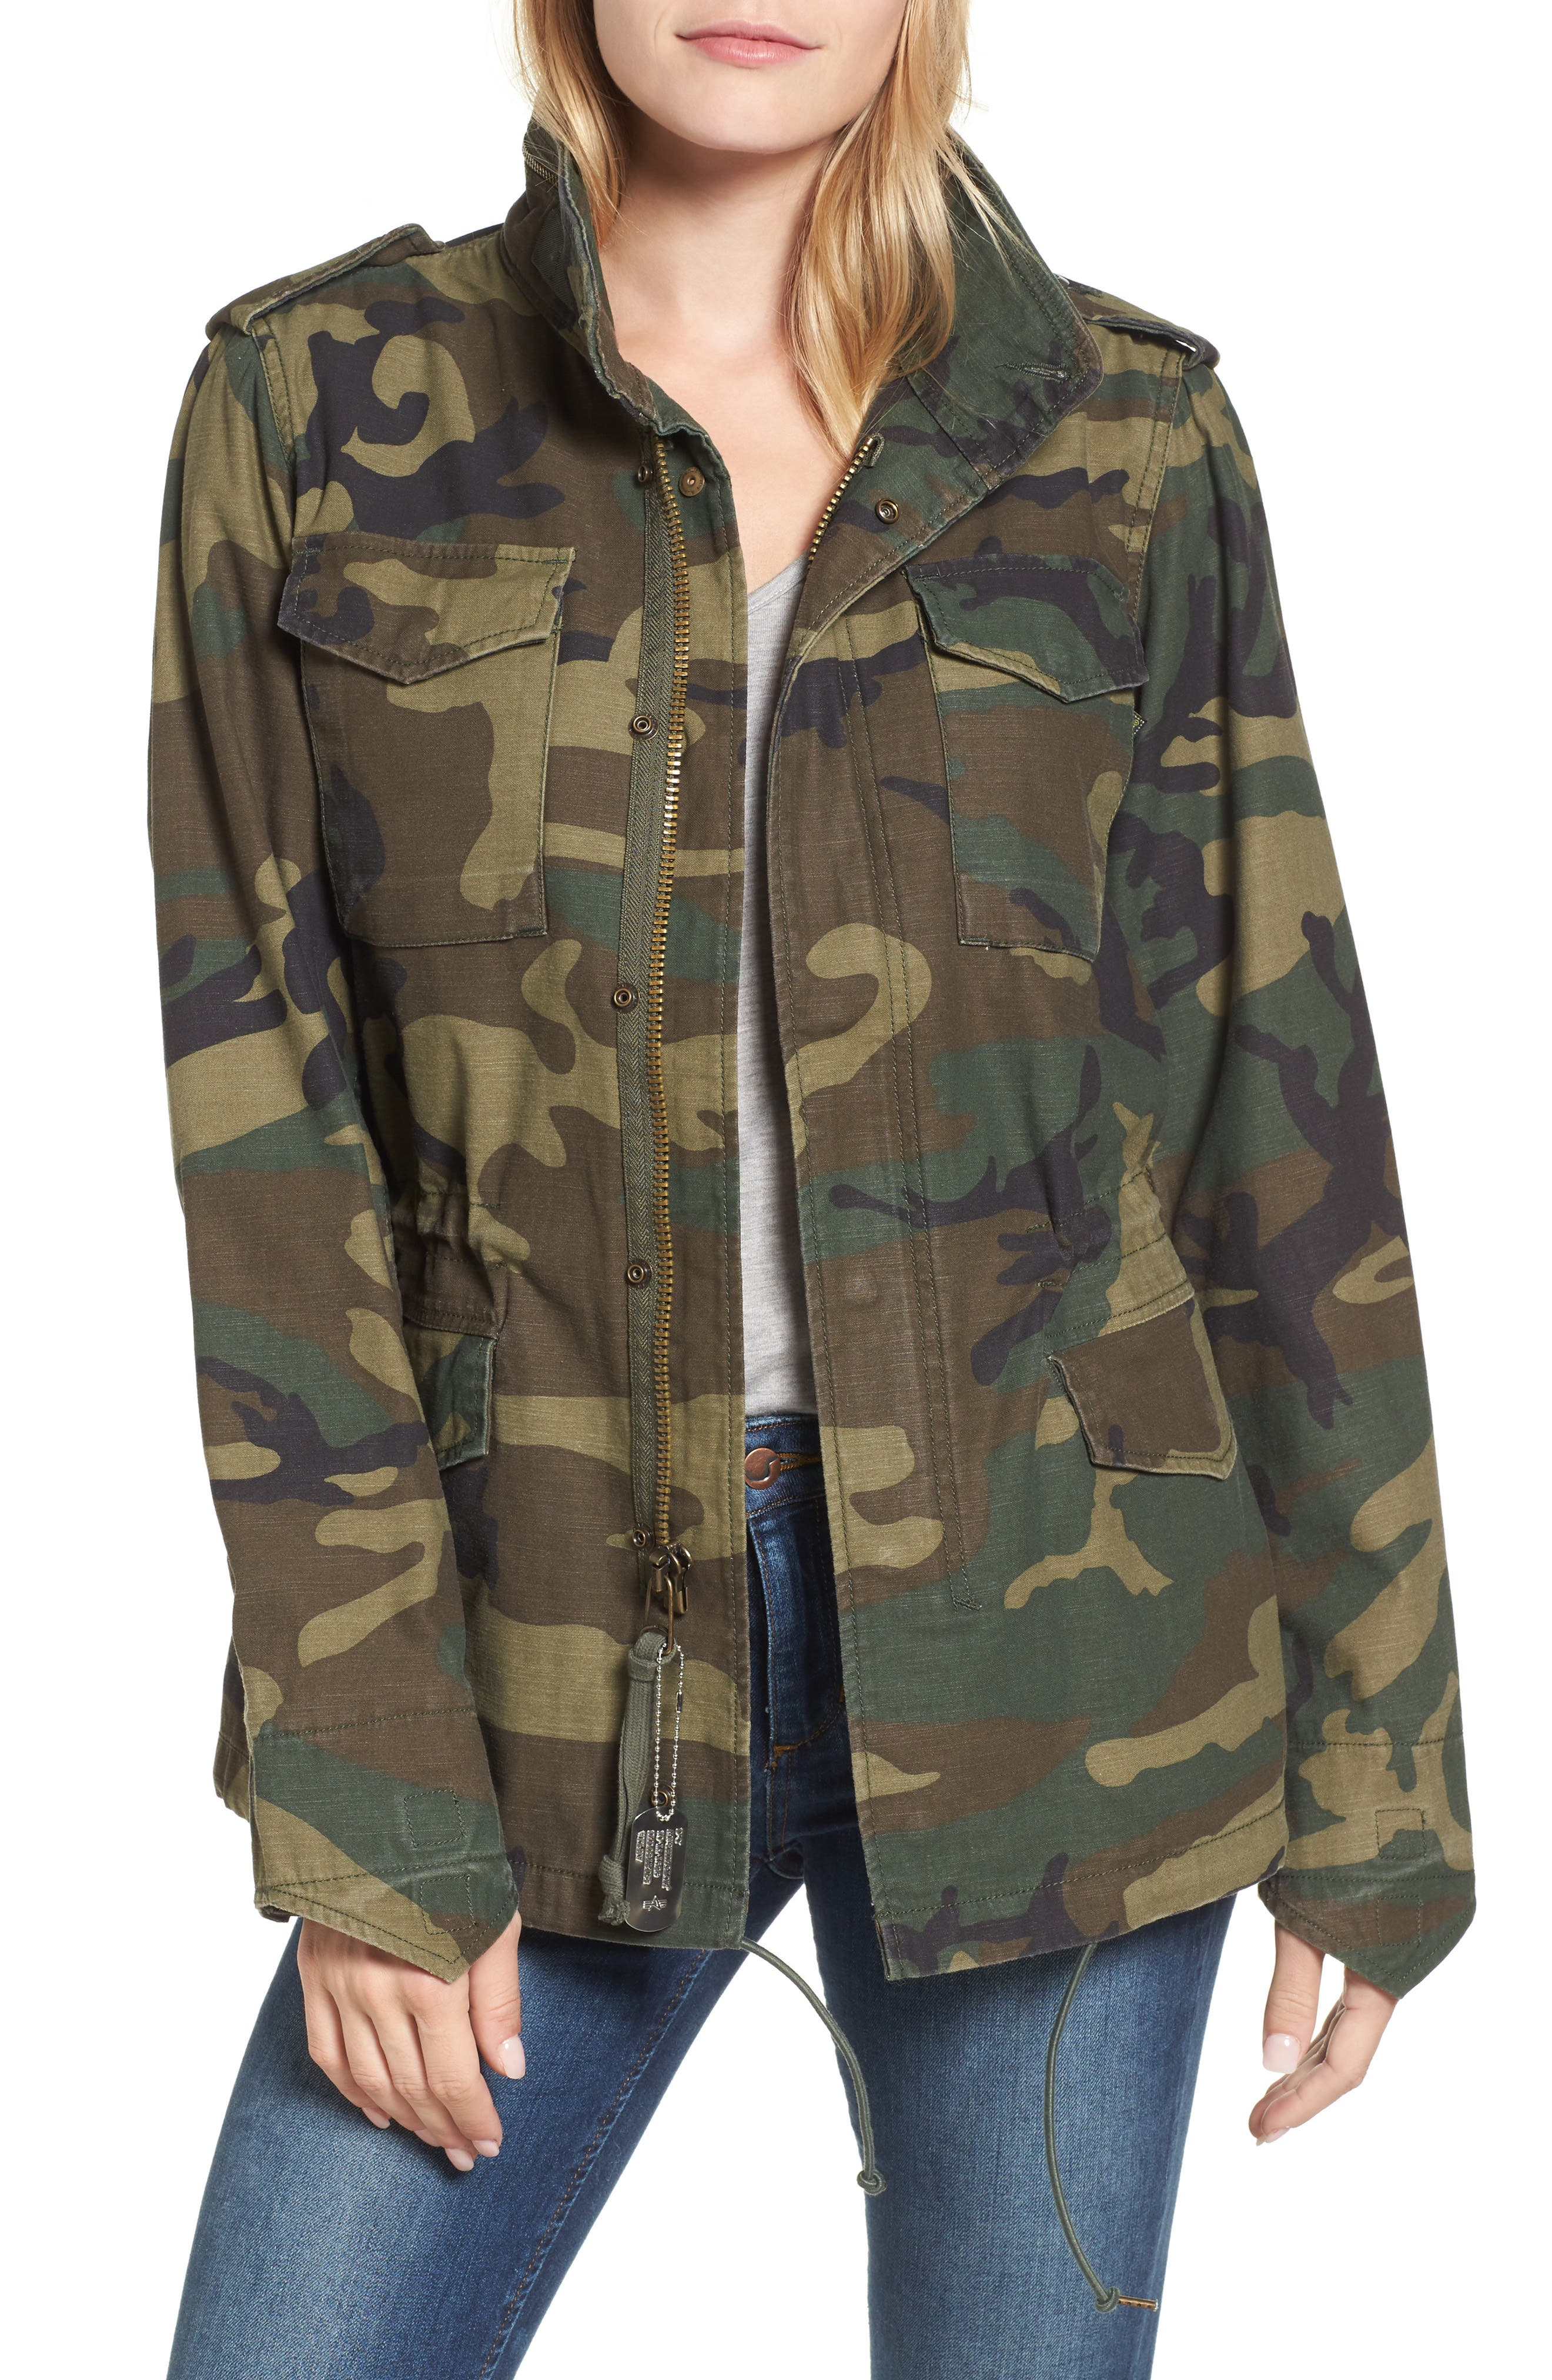 M-65 Defender Camo Field Jacket,                             Main thumbnail 1, color,                             WOODLAND CAMO